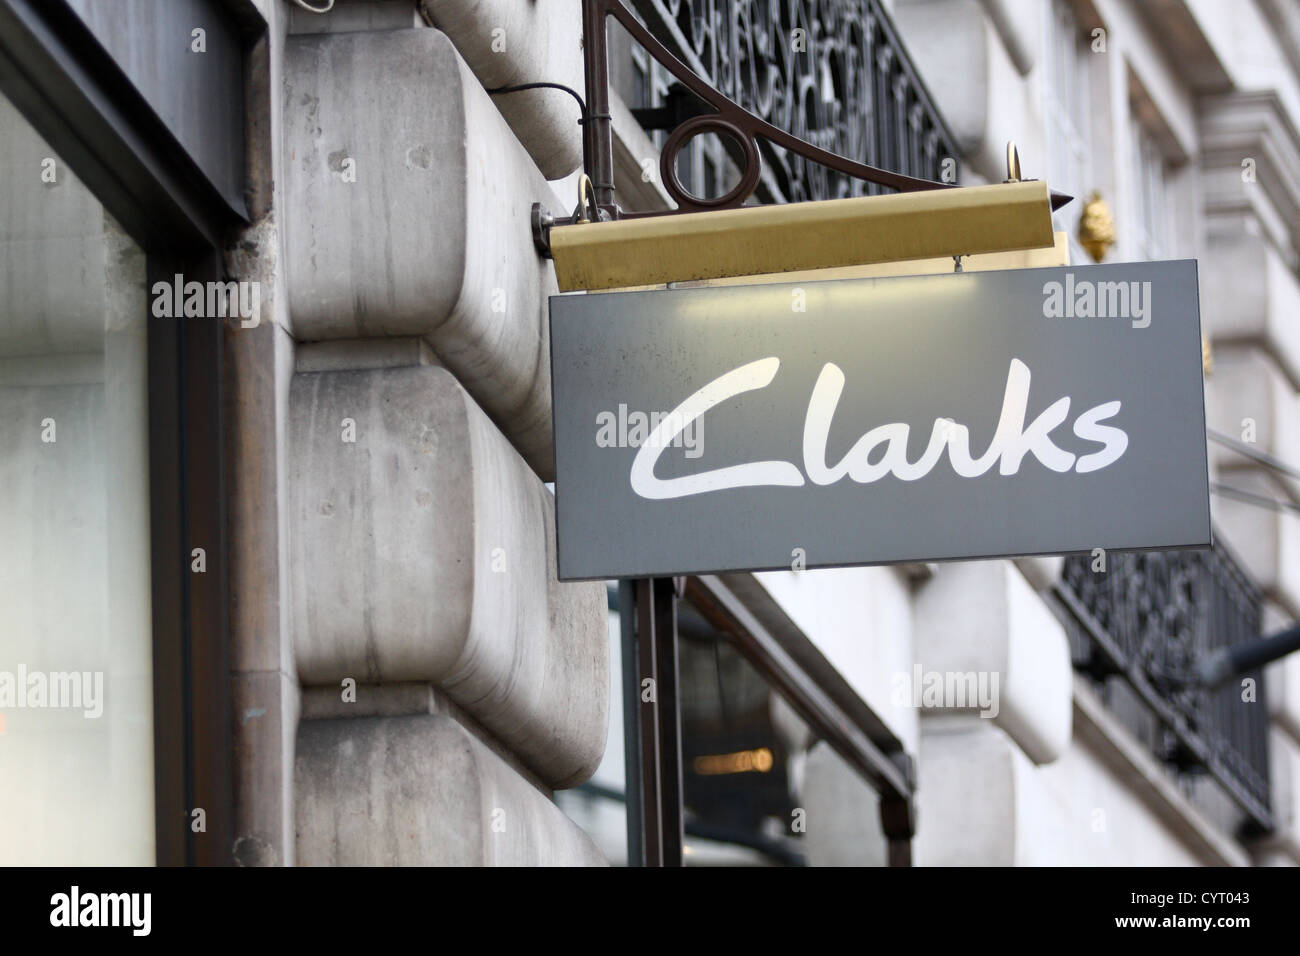 Clarks Shoes London Regent Street